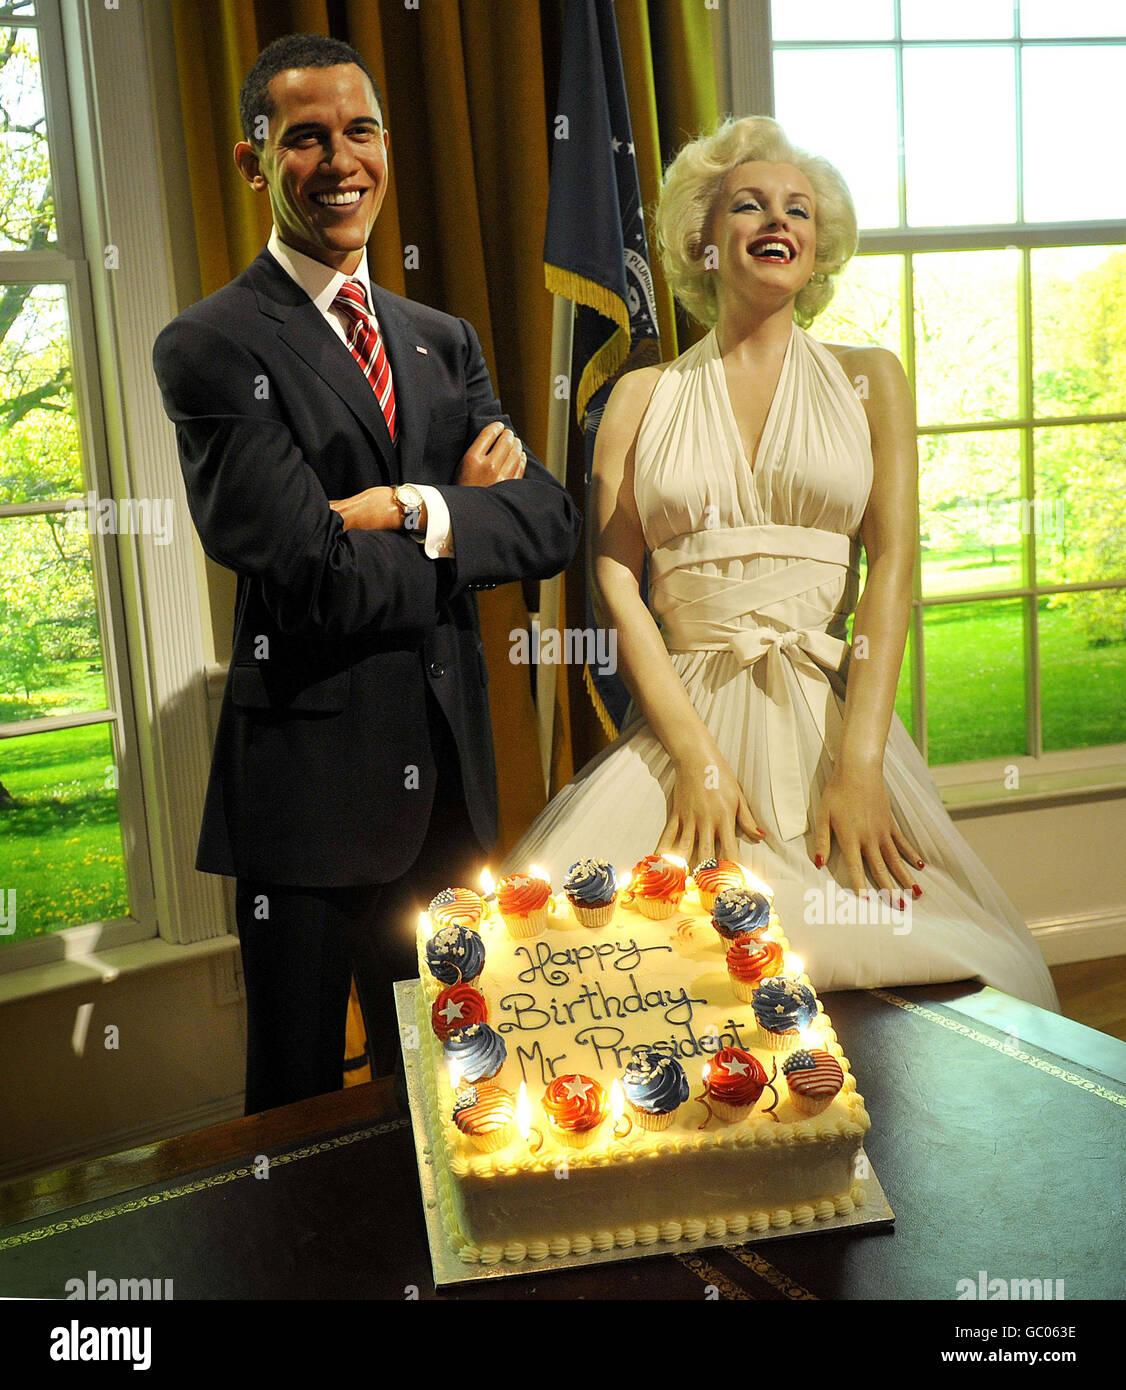 Marvelous President Obama Cake Birthday Stock Photos President Obama Cake Funny Birthday Cards Online Inifodamsfinfo